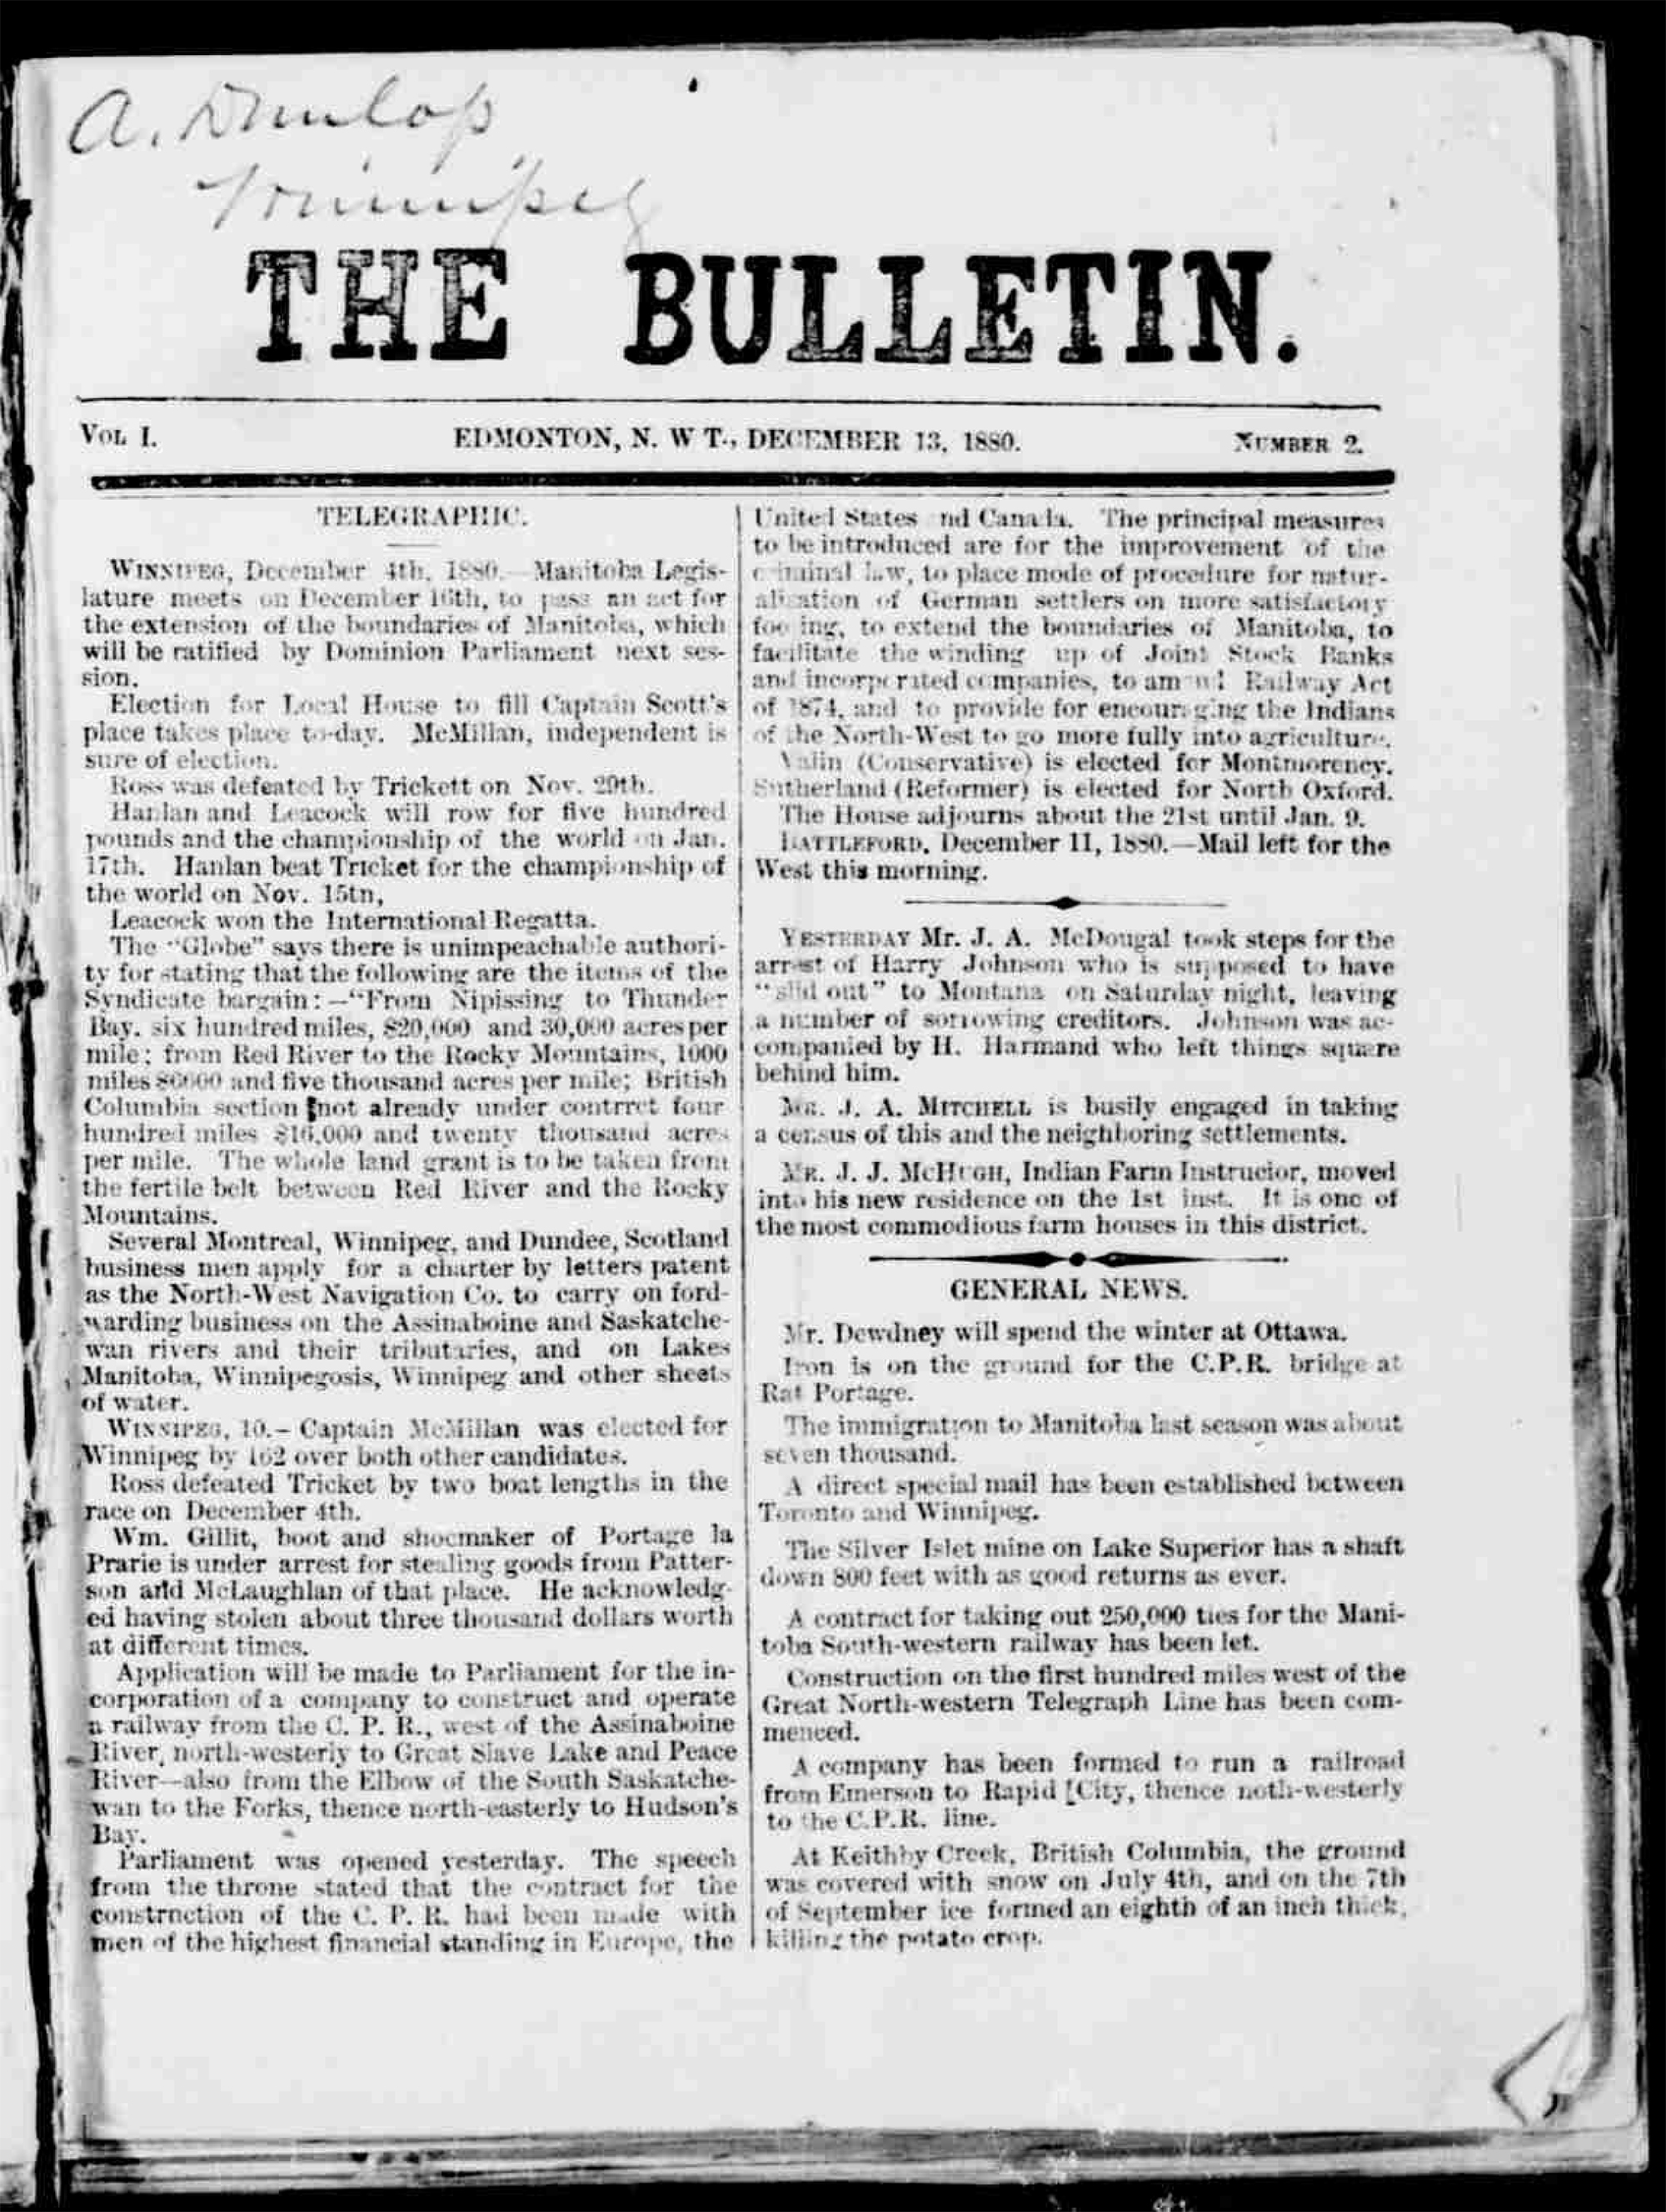 The Edmonton Bulletin